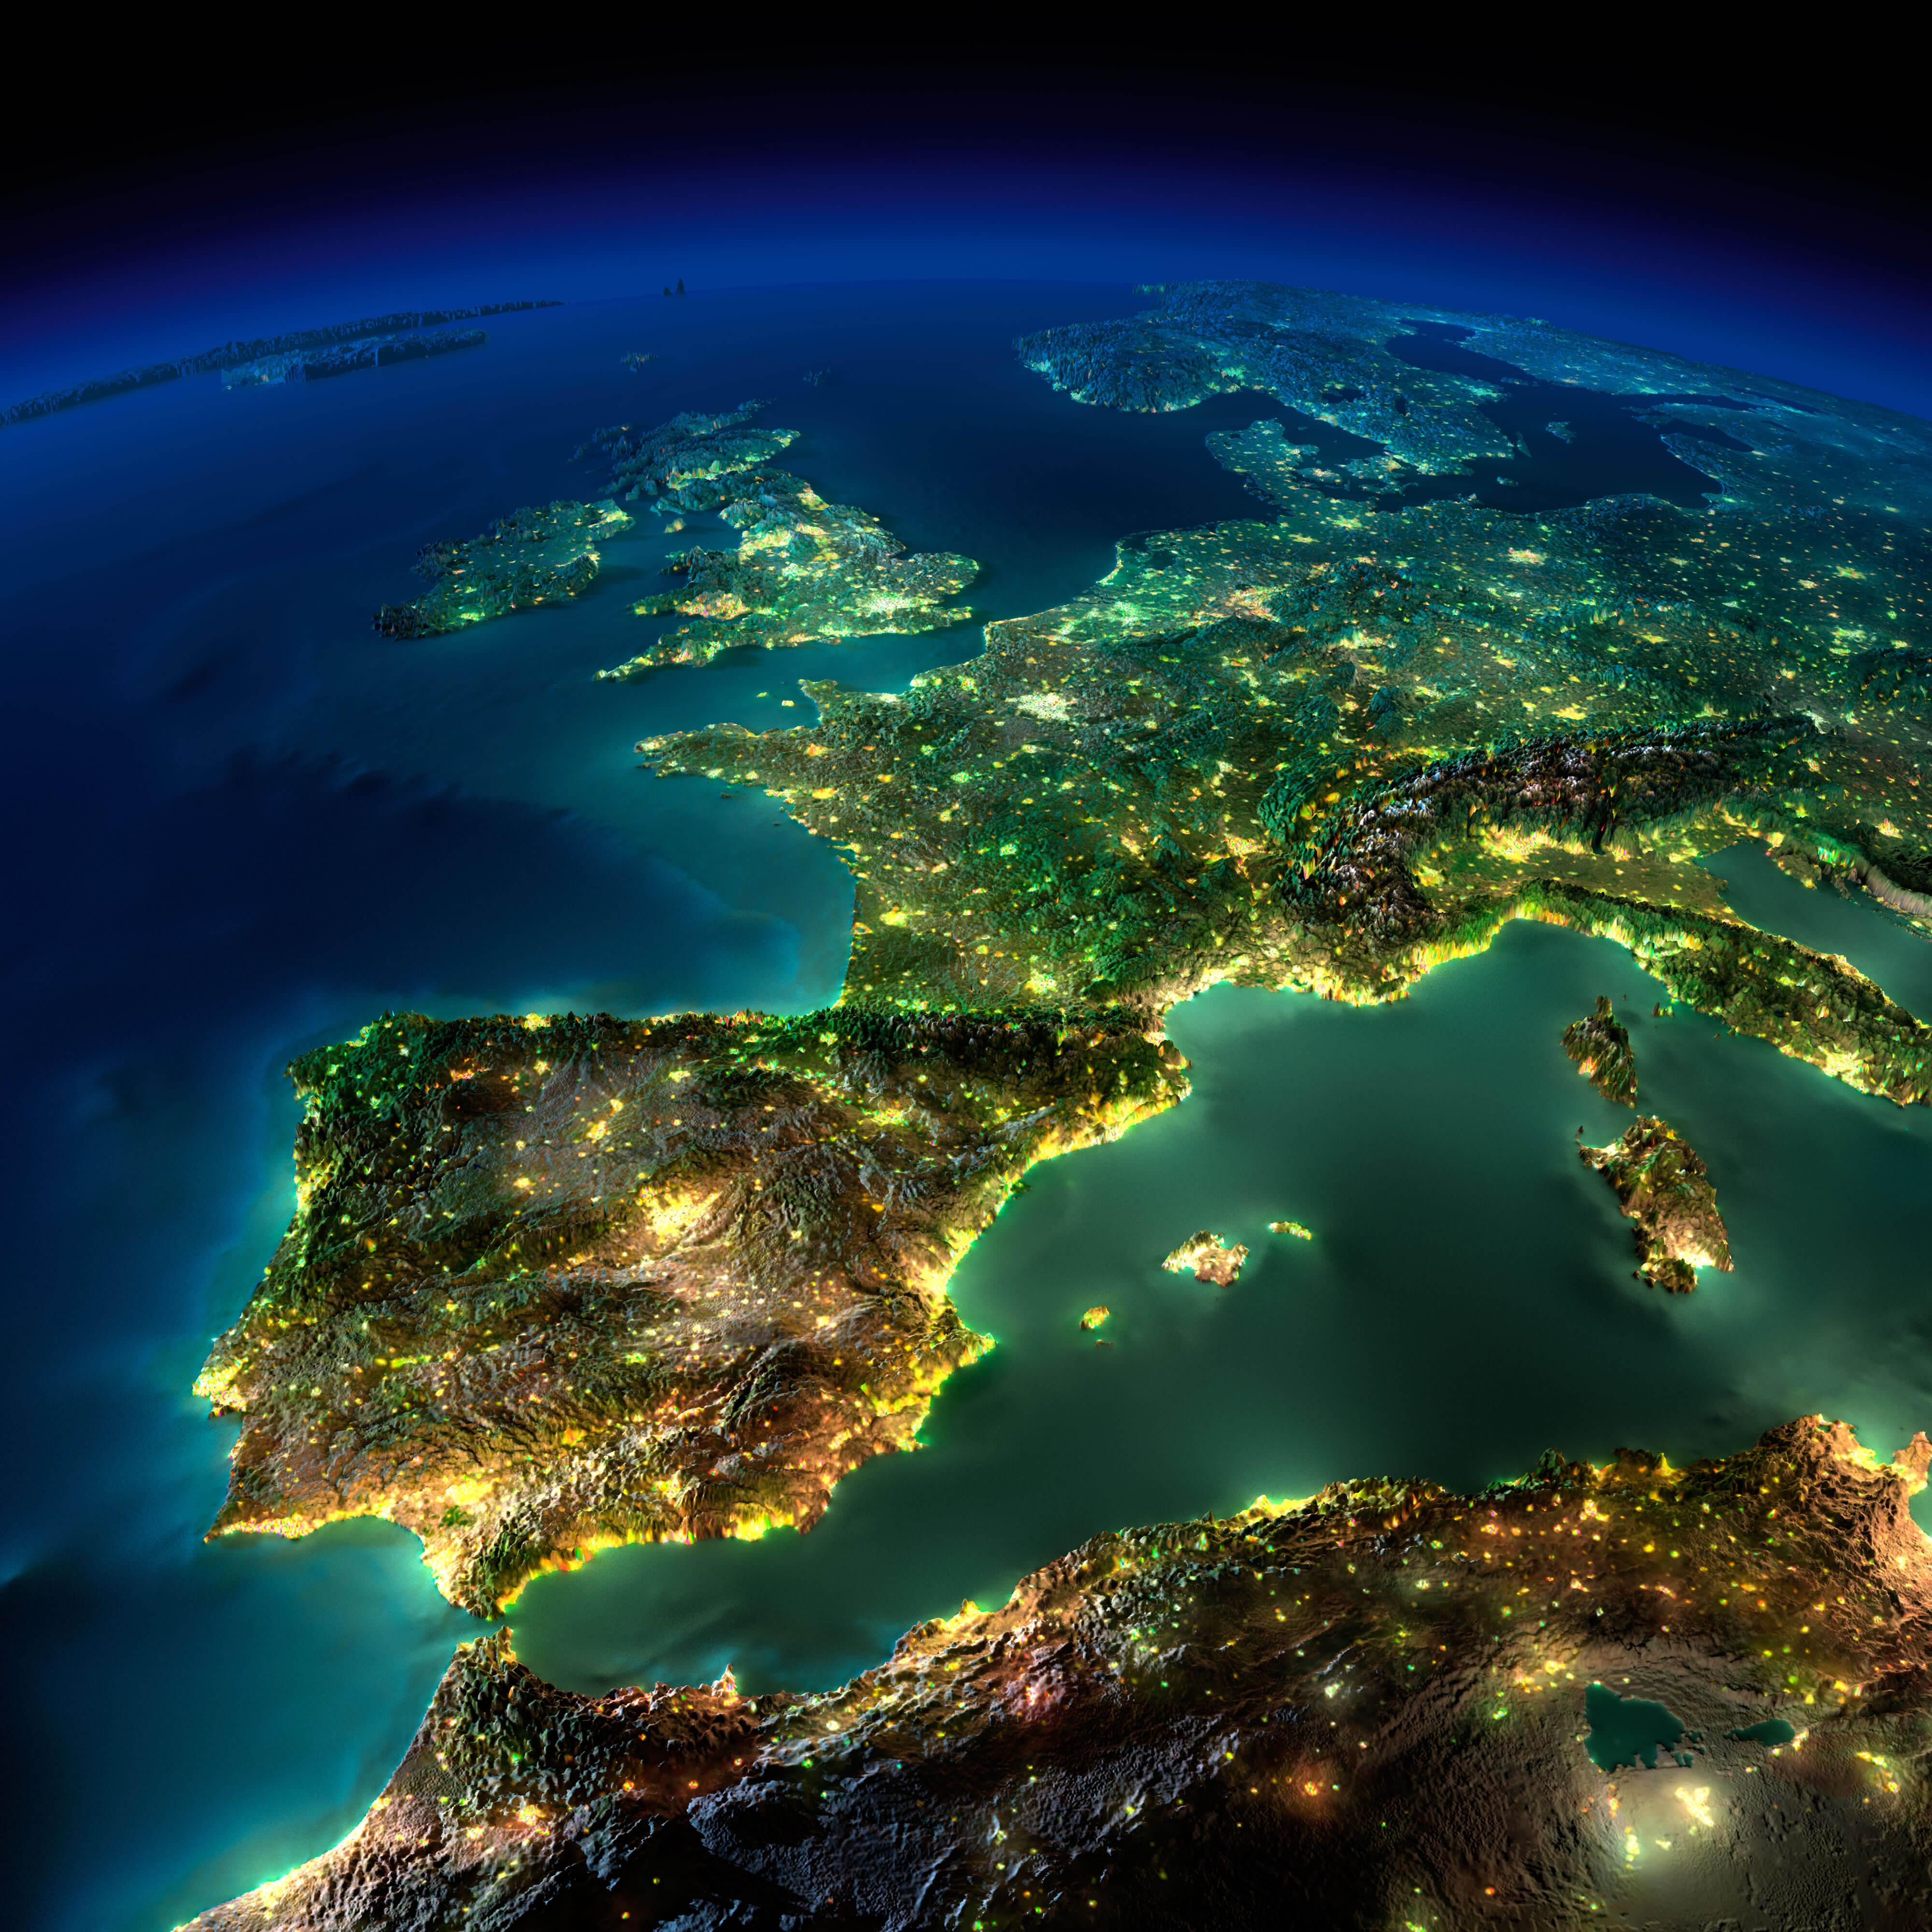 Spain & Europe Satellite Image with Moonlight